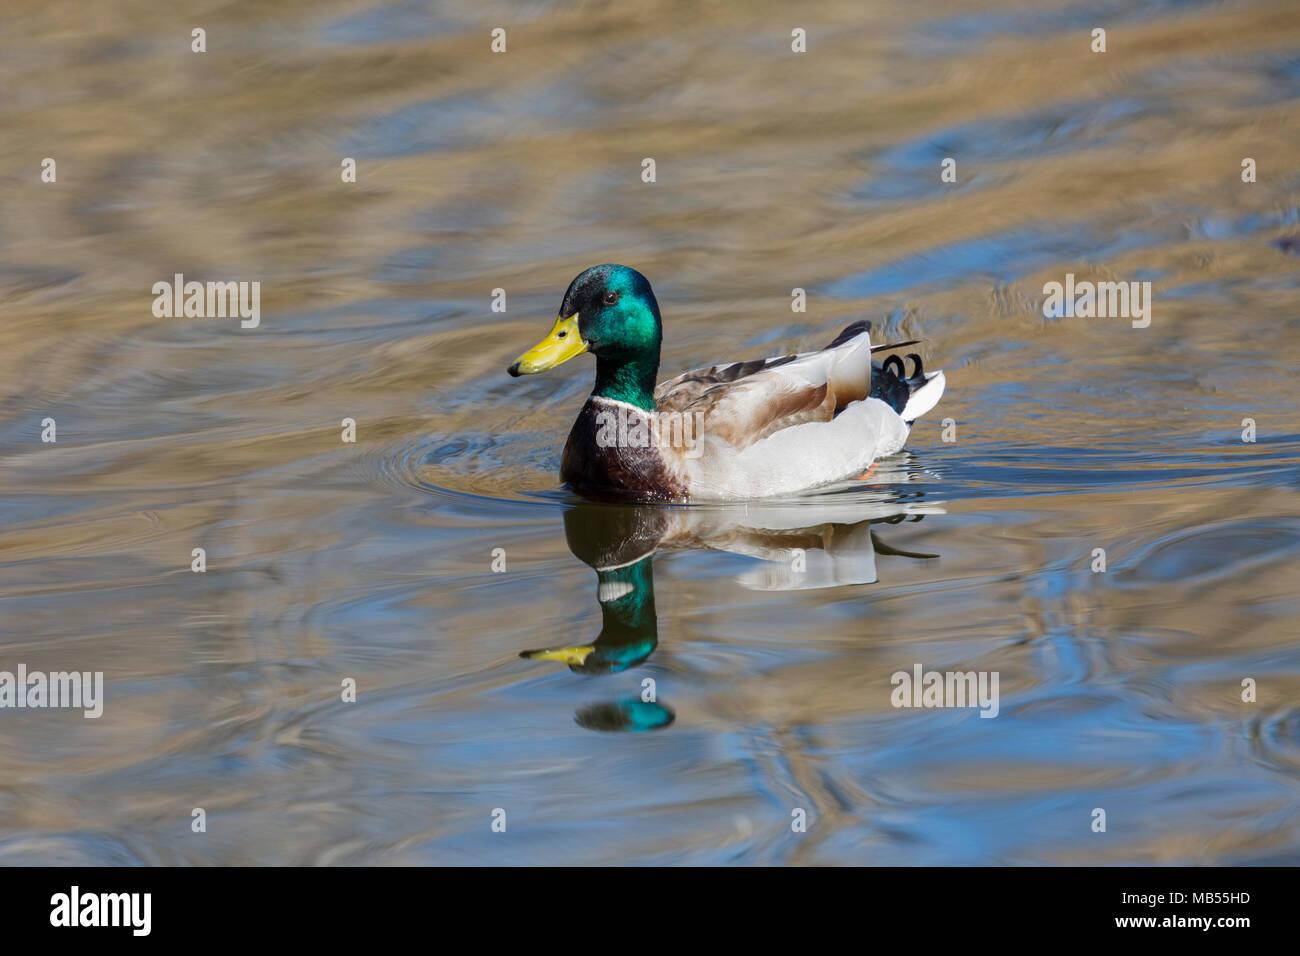 swimming natural male mallard duck (anas platyrhynchos), water, reflections - Stock Image